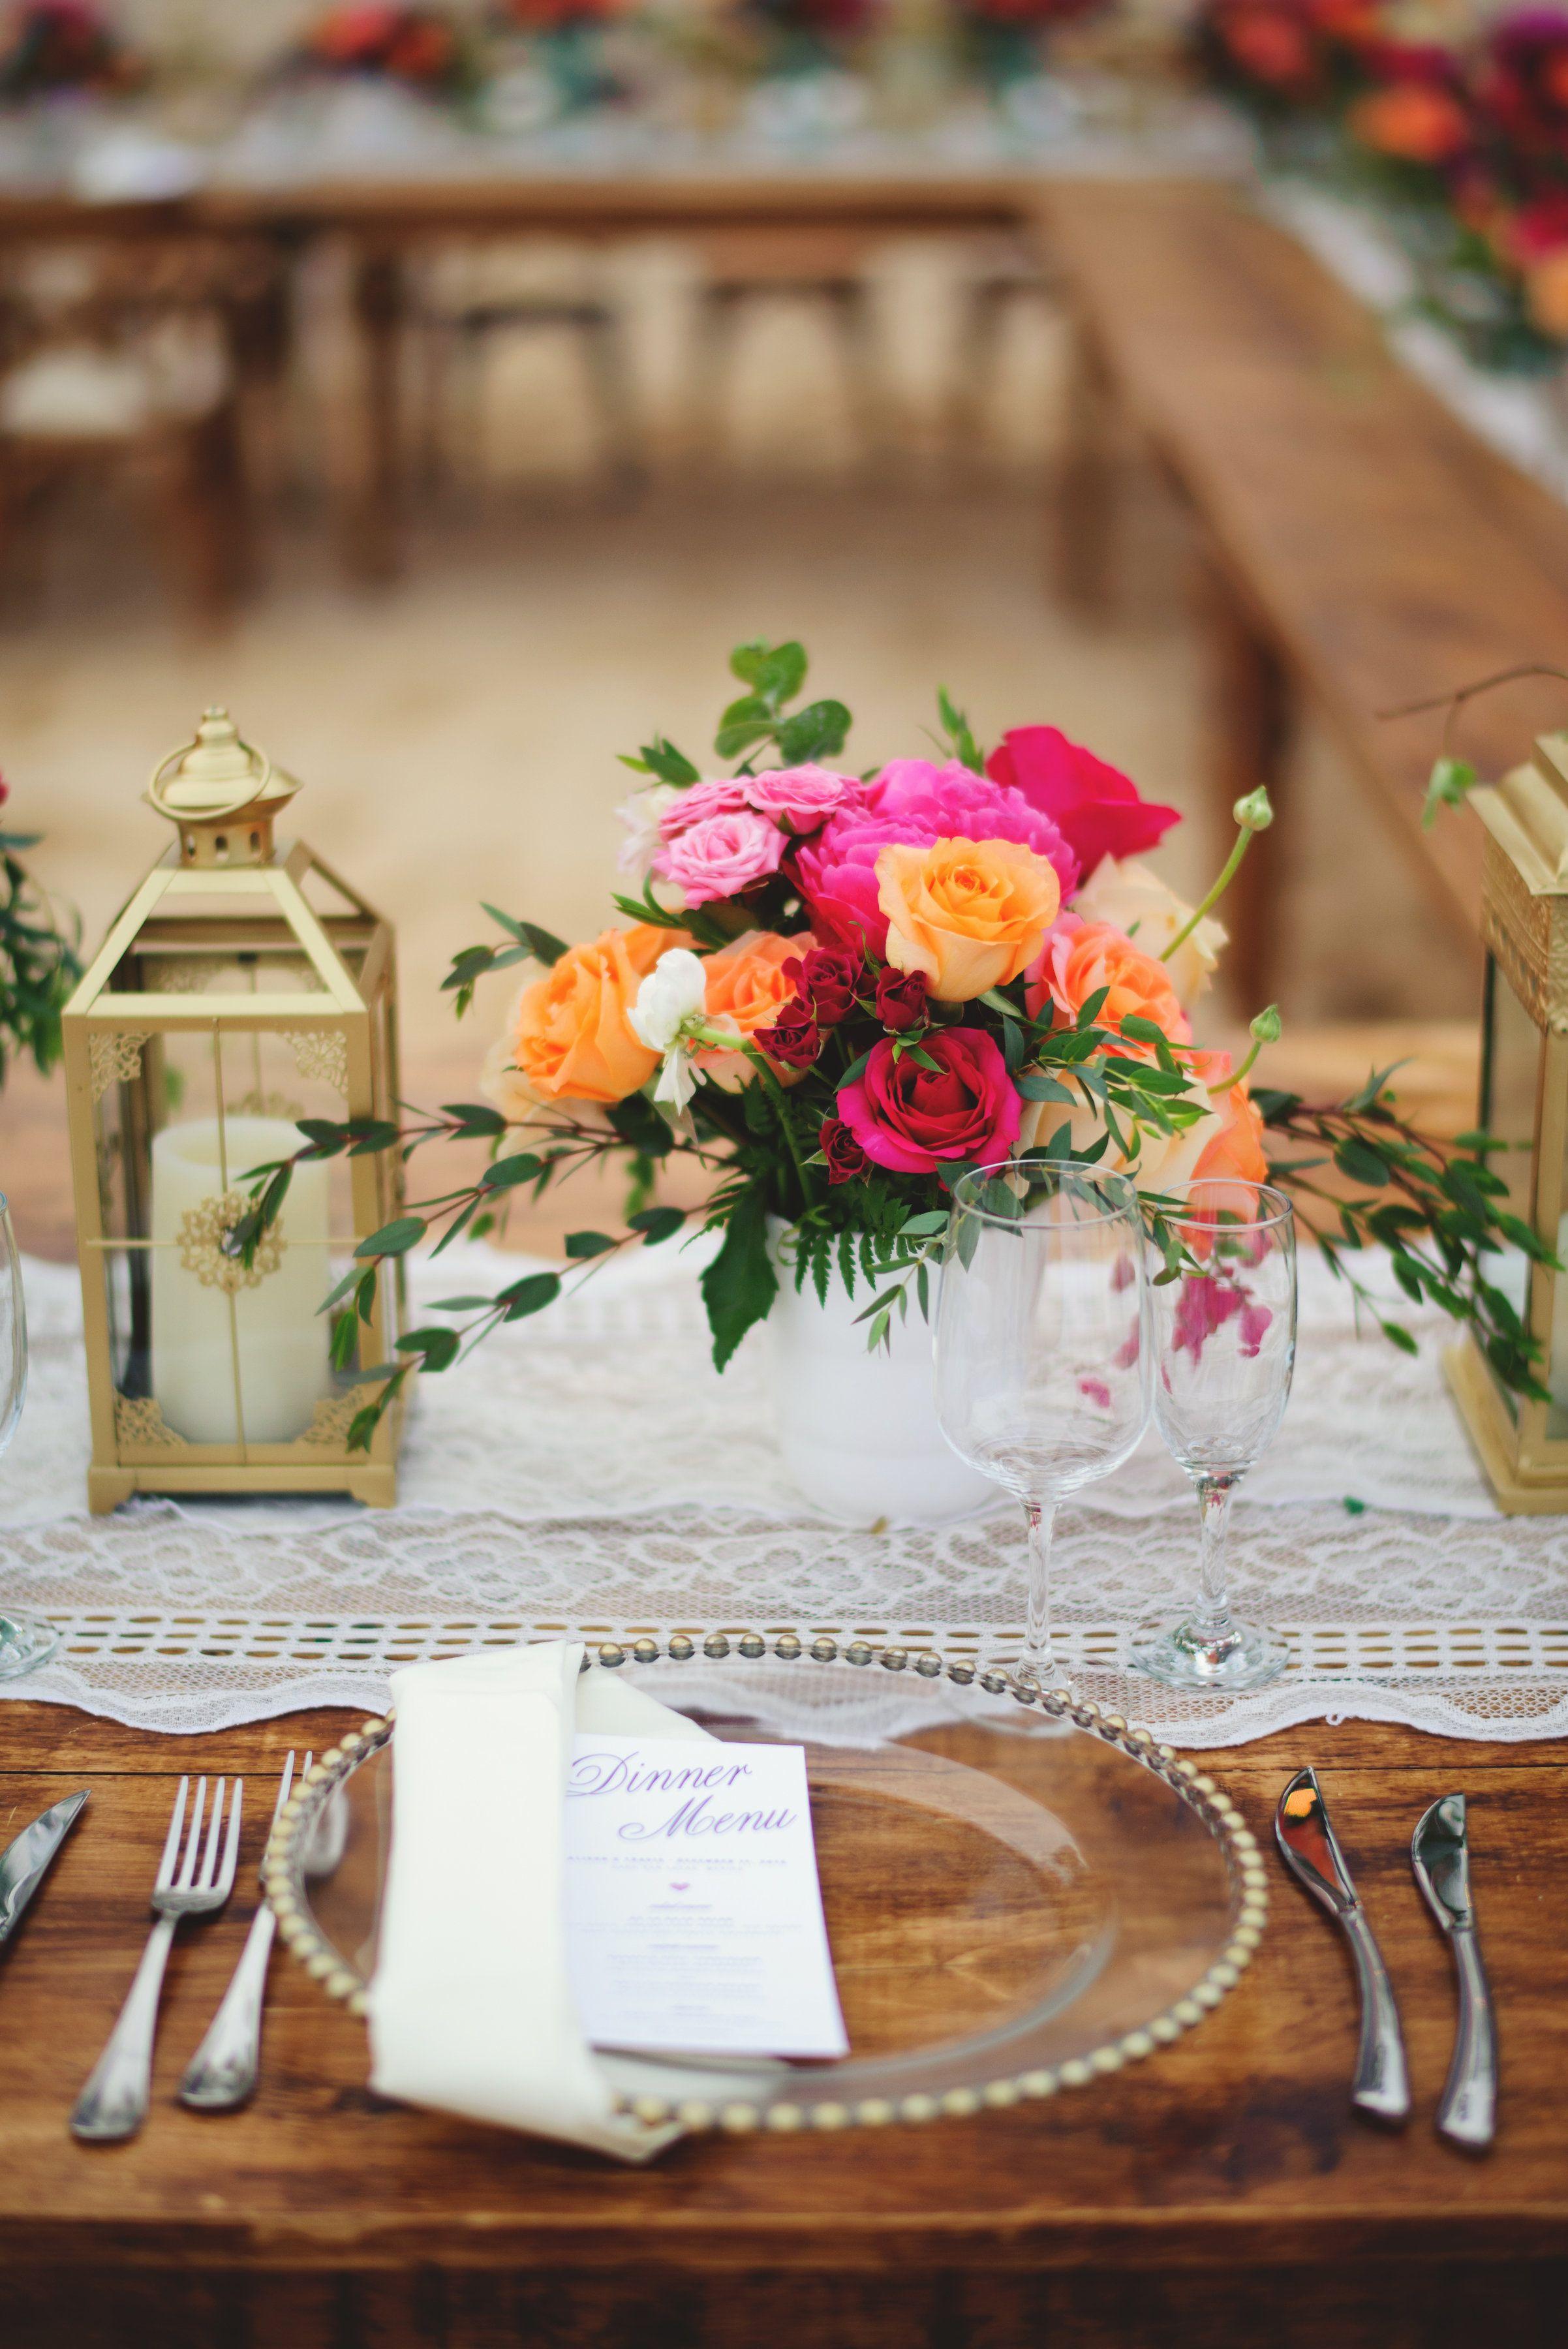 Reception Dinner Table setting at Villa la Estancia. Design by Cabo Wedding Services